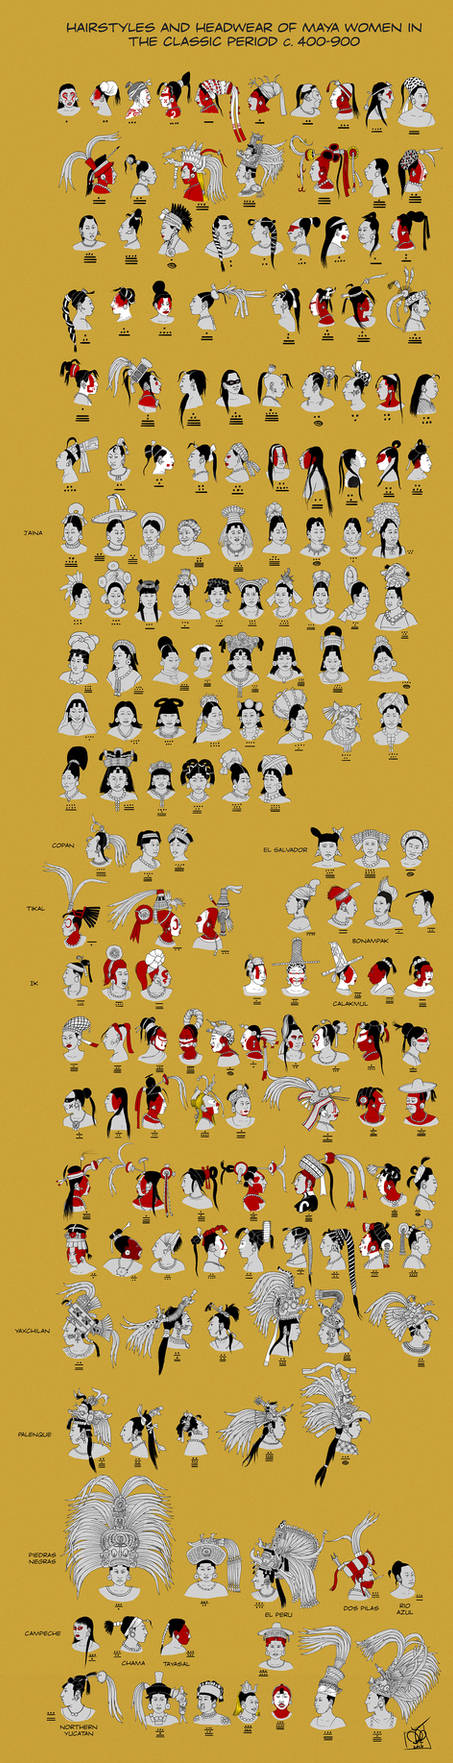 Maya Women Hairstyles of the Classic Period by Kamazotz